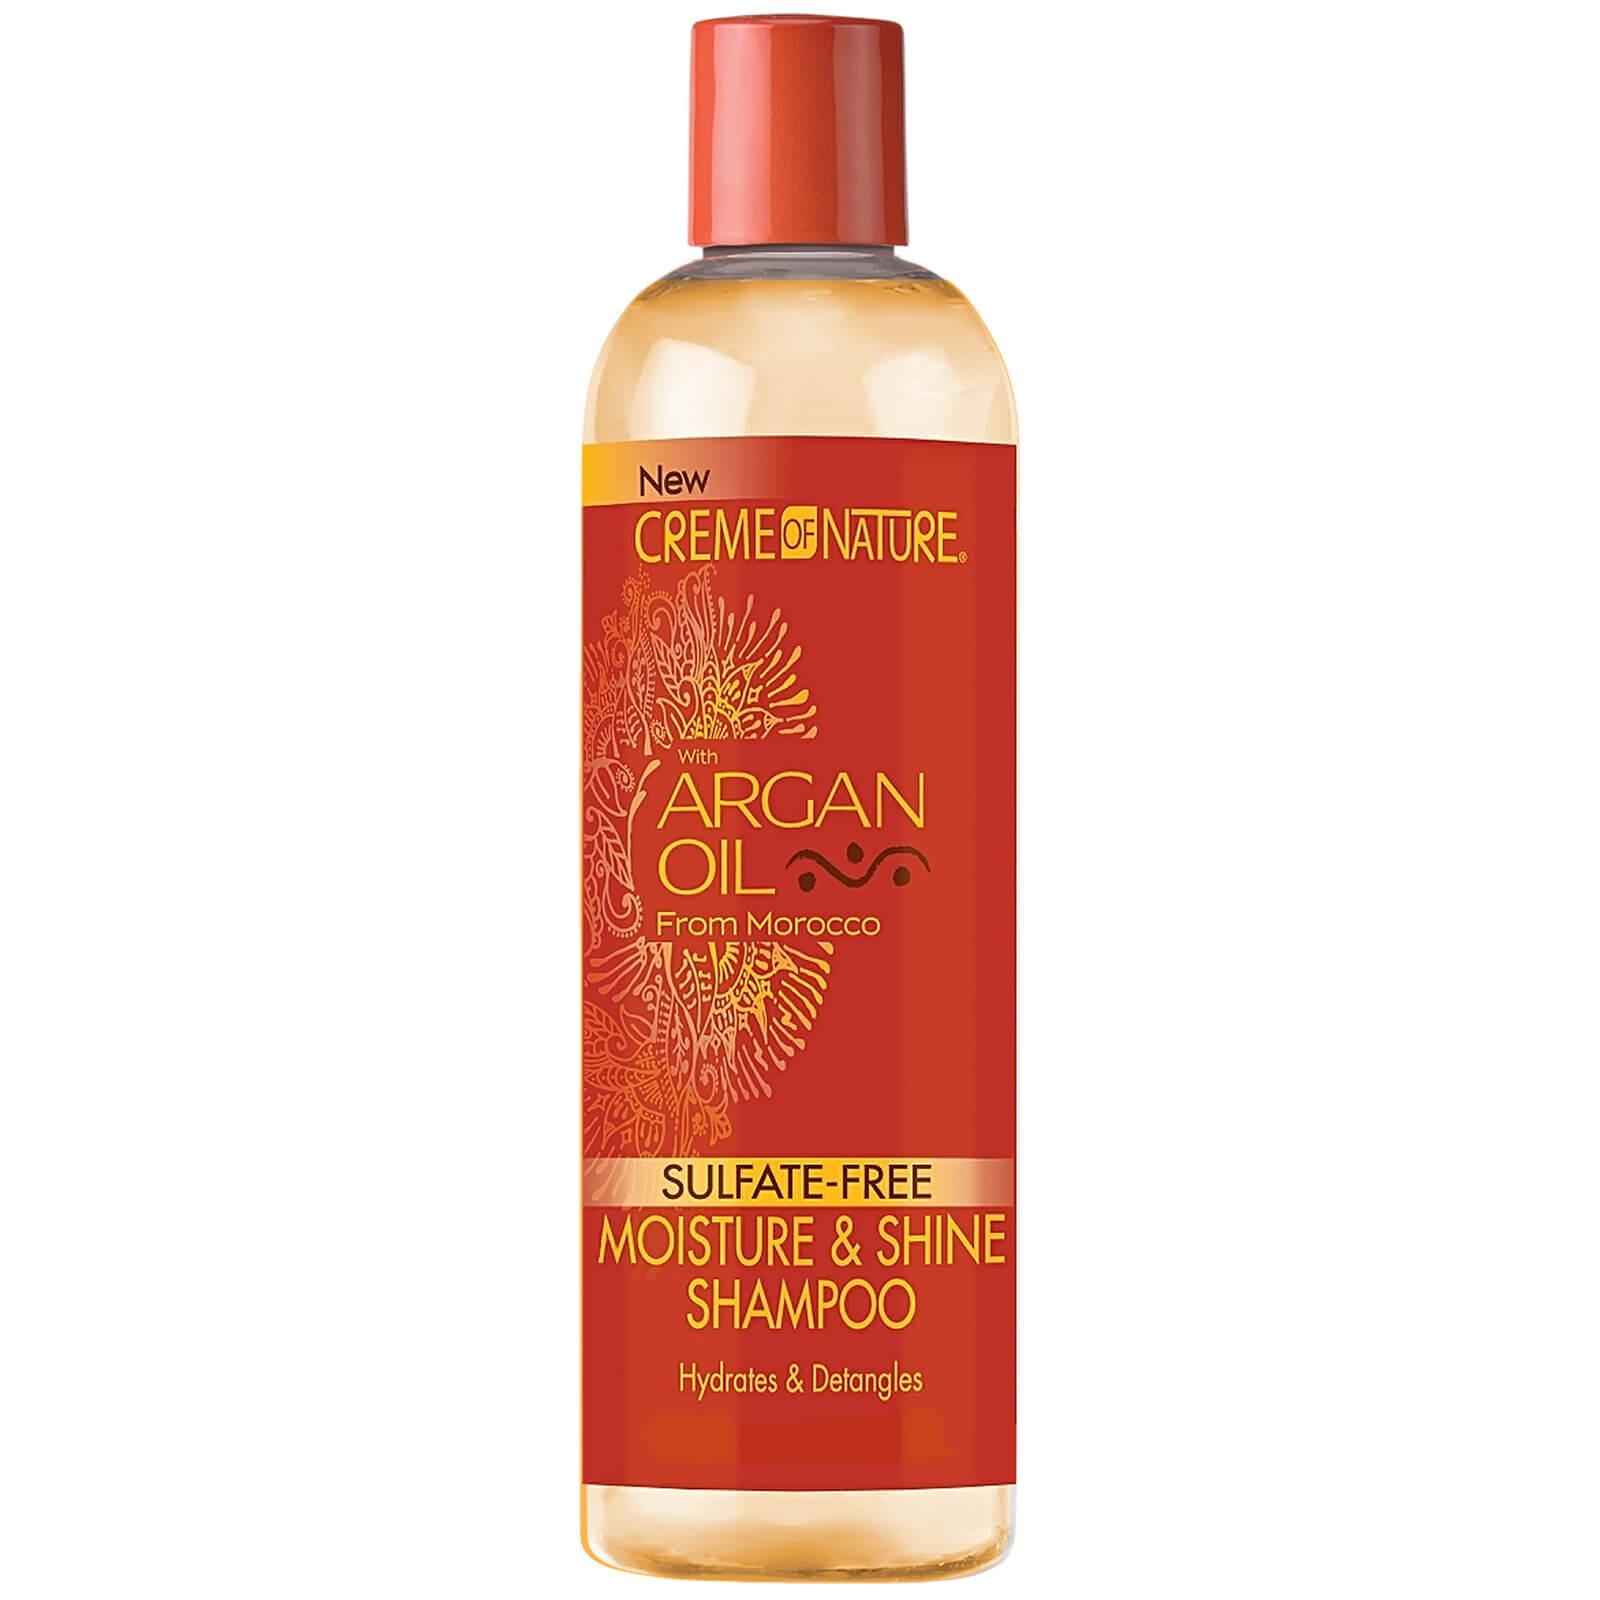 Купить Crème of Nature Argan Oil Moisture and Shine Shampoo Sulfate-Free 354ml